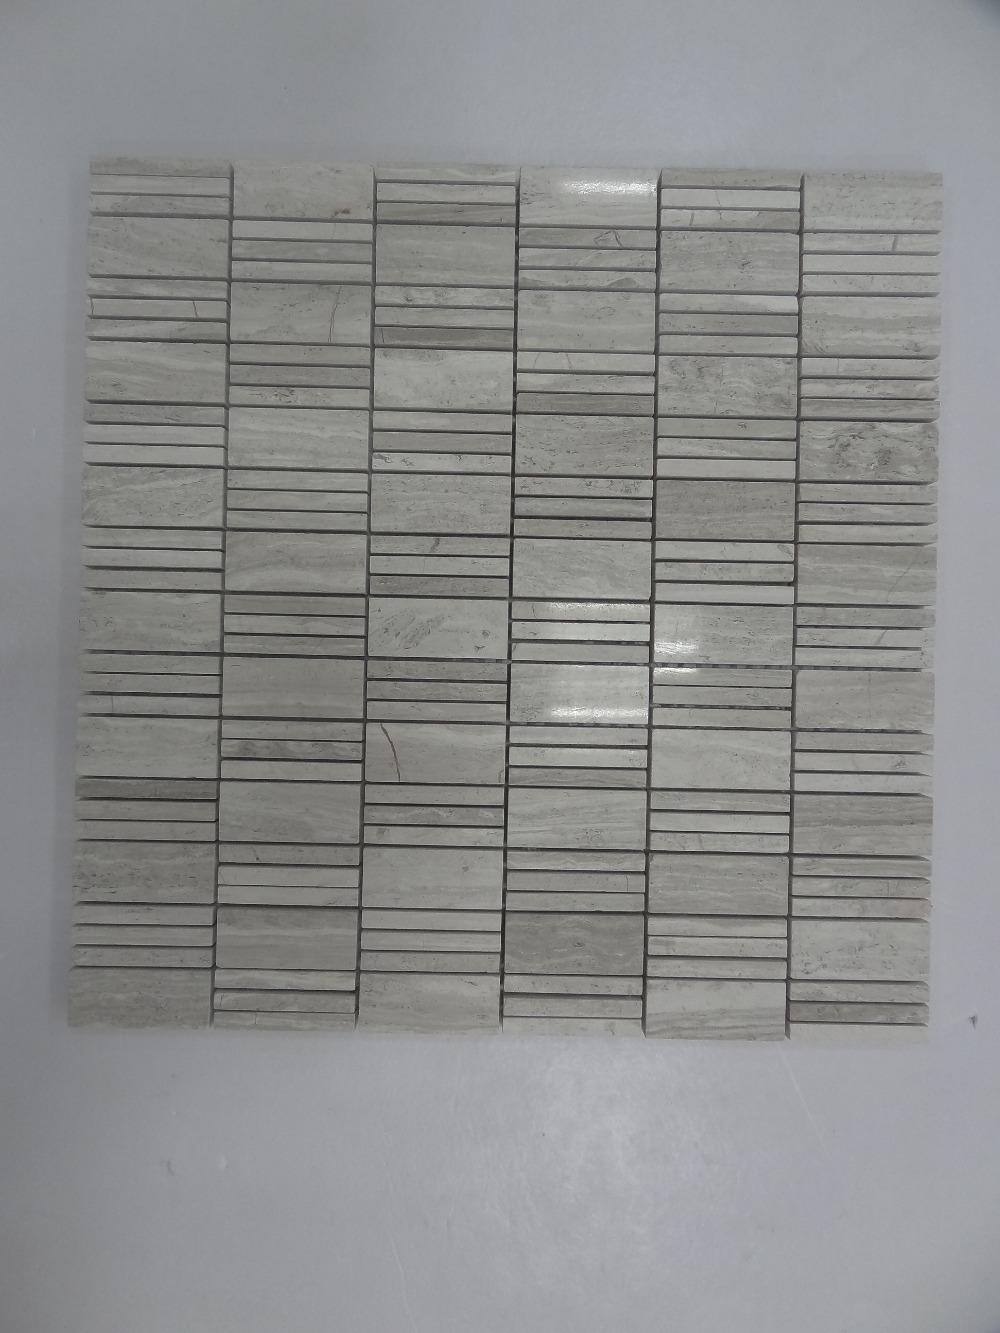 m032 houten grijze mozaïek tegel patronen gespiegeld tegels ...